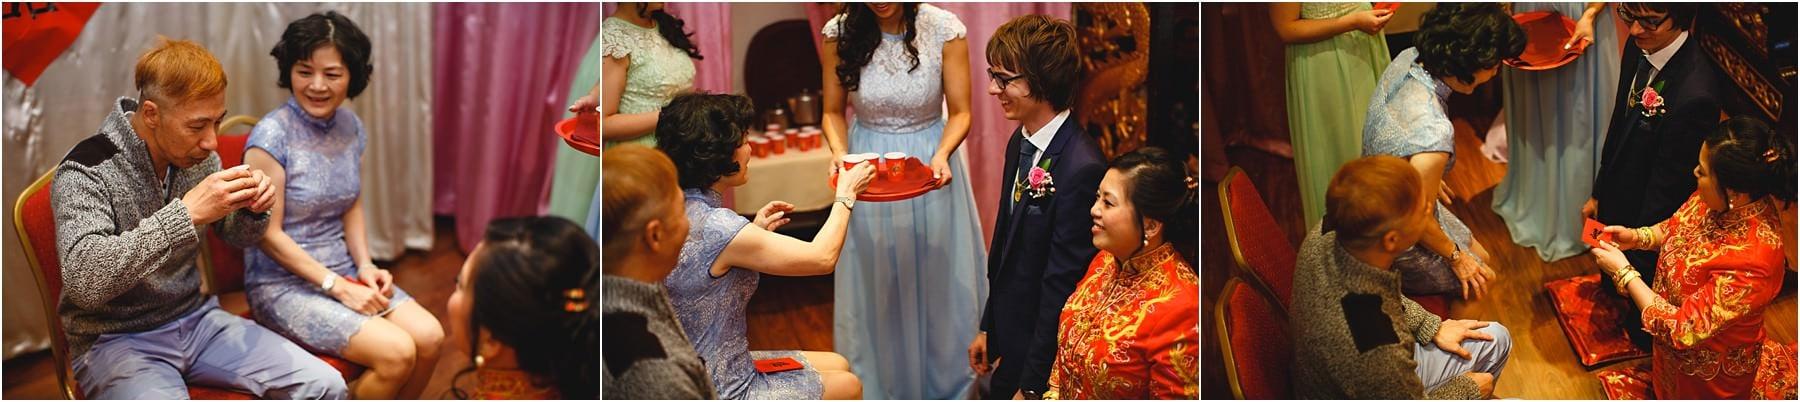 Chinese_Wedding_Photography_0047